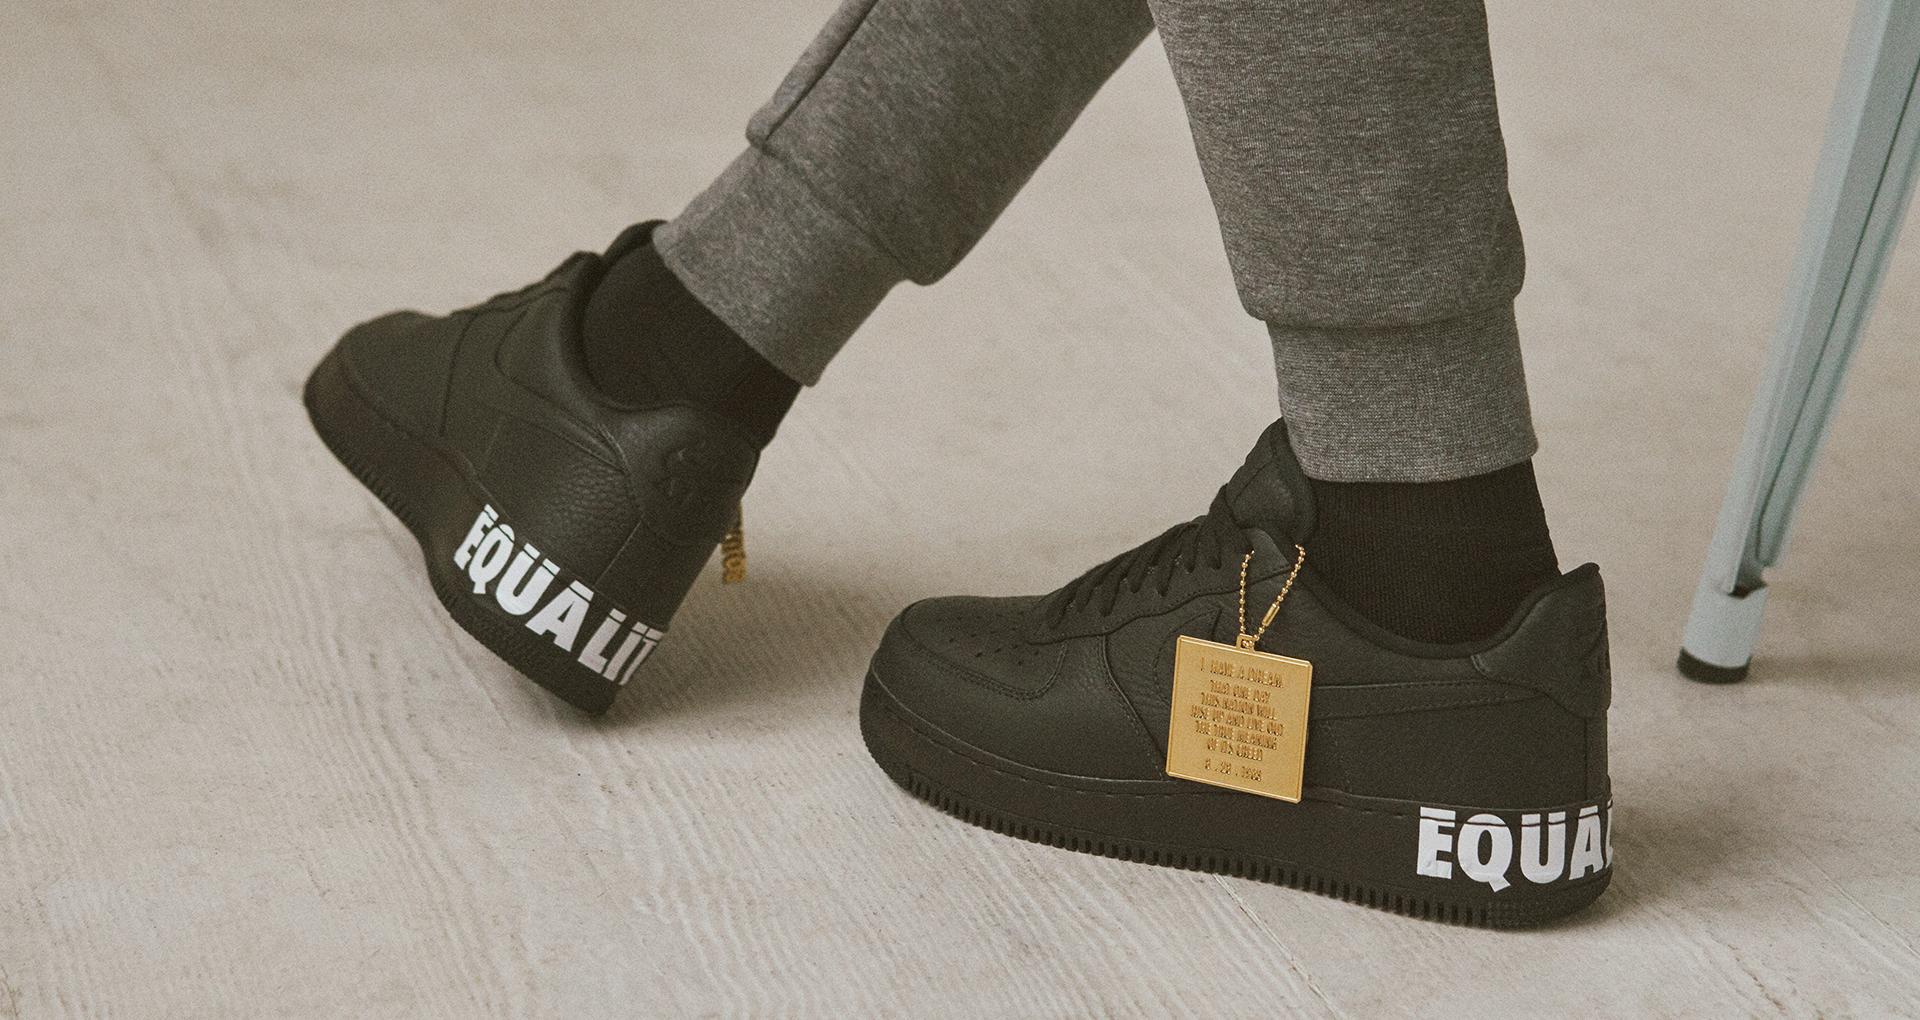 best sneakers c3805 5c633 Sneaker Roundup A Look At This Weeks Releases